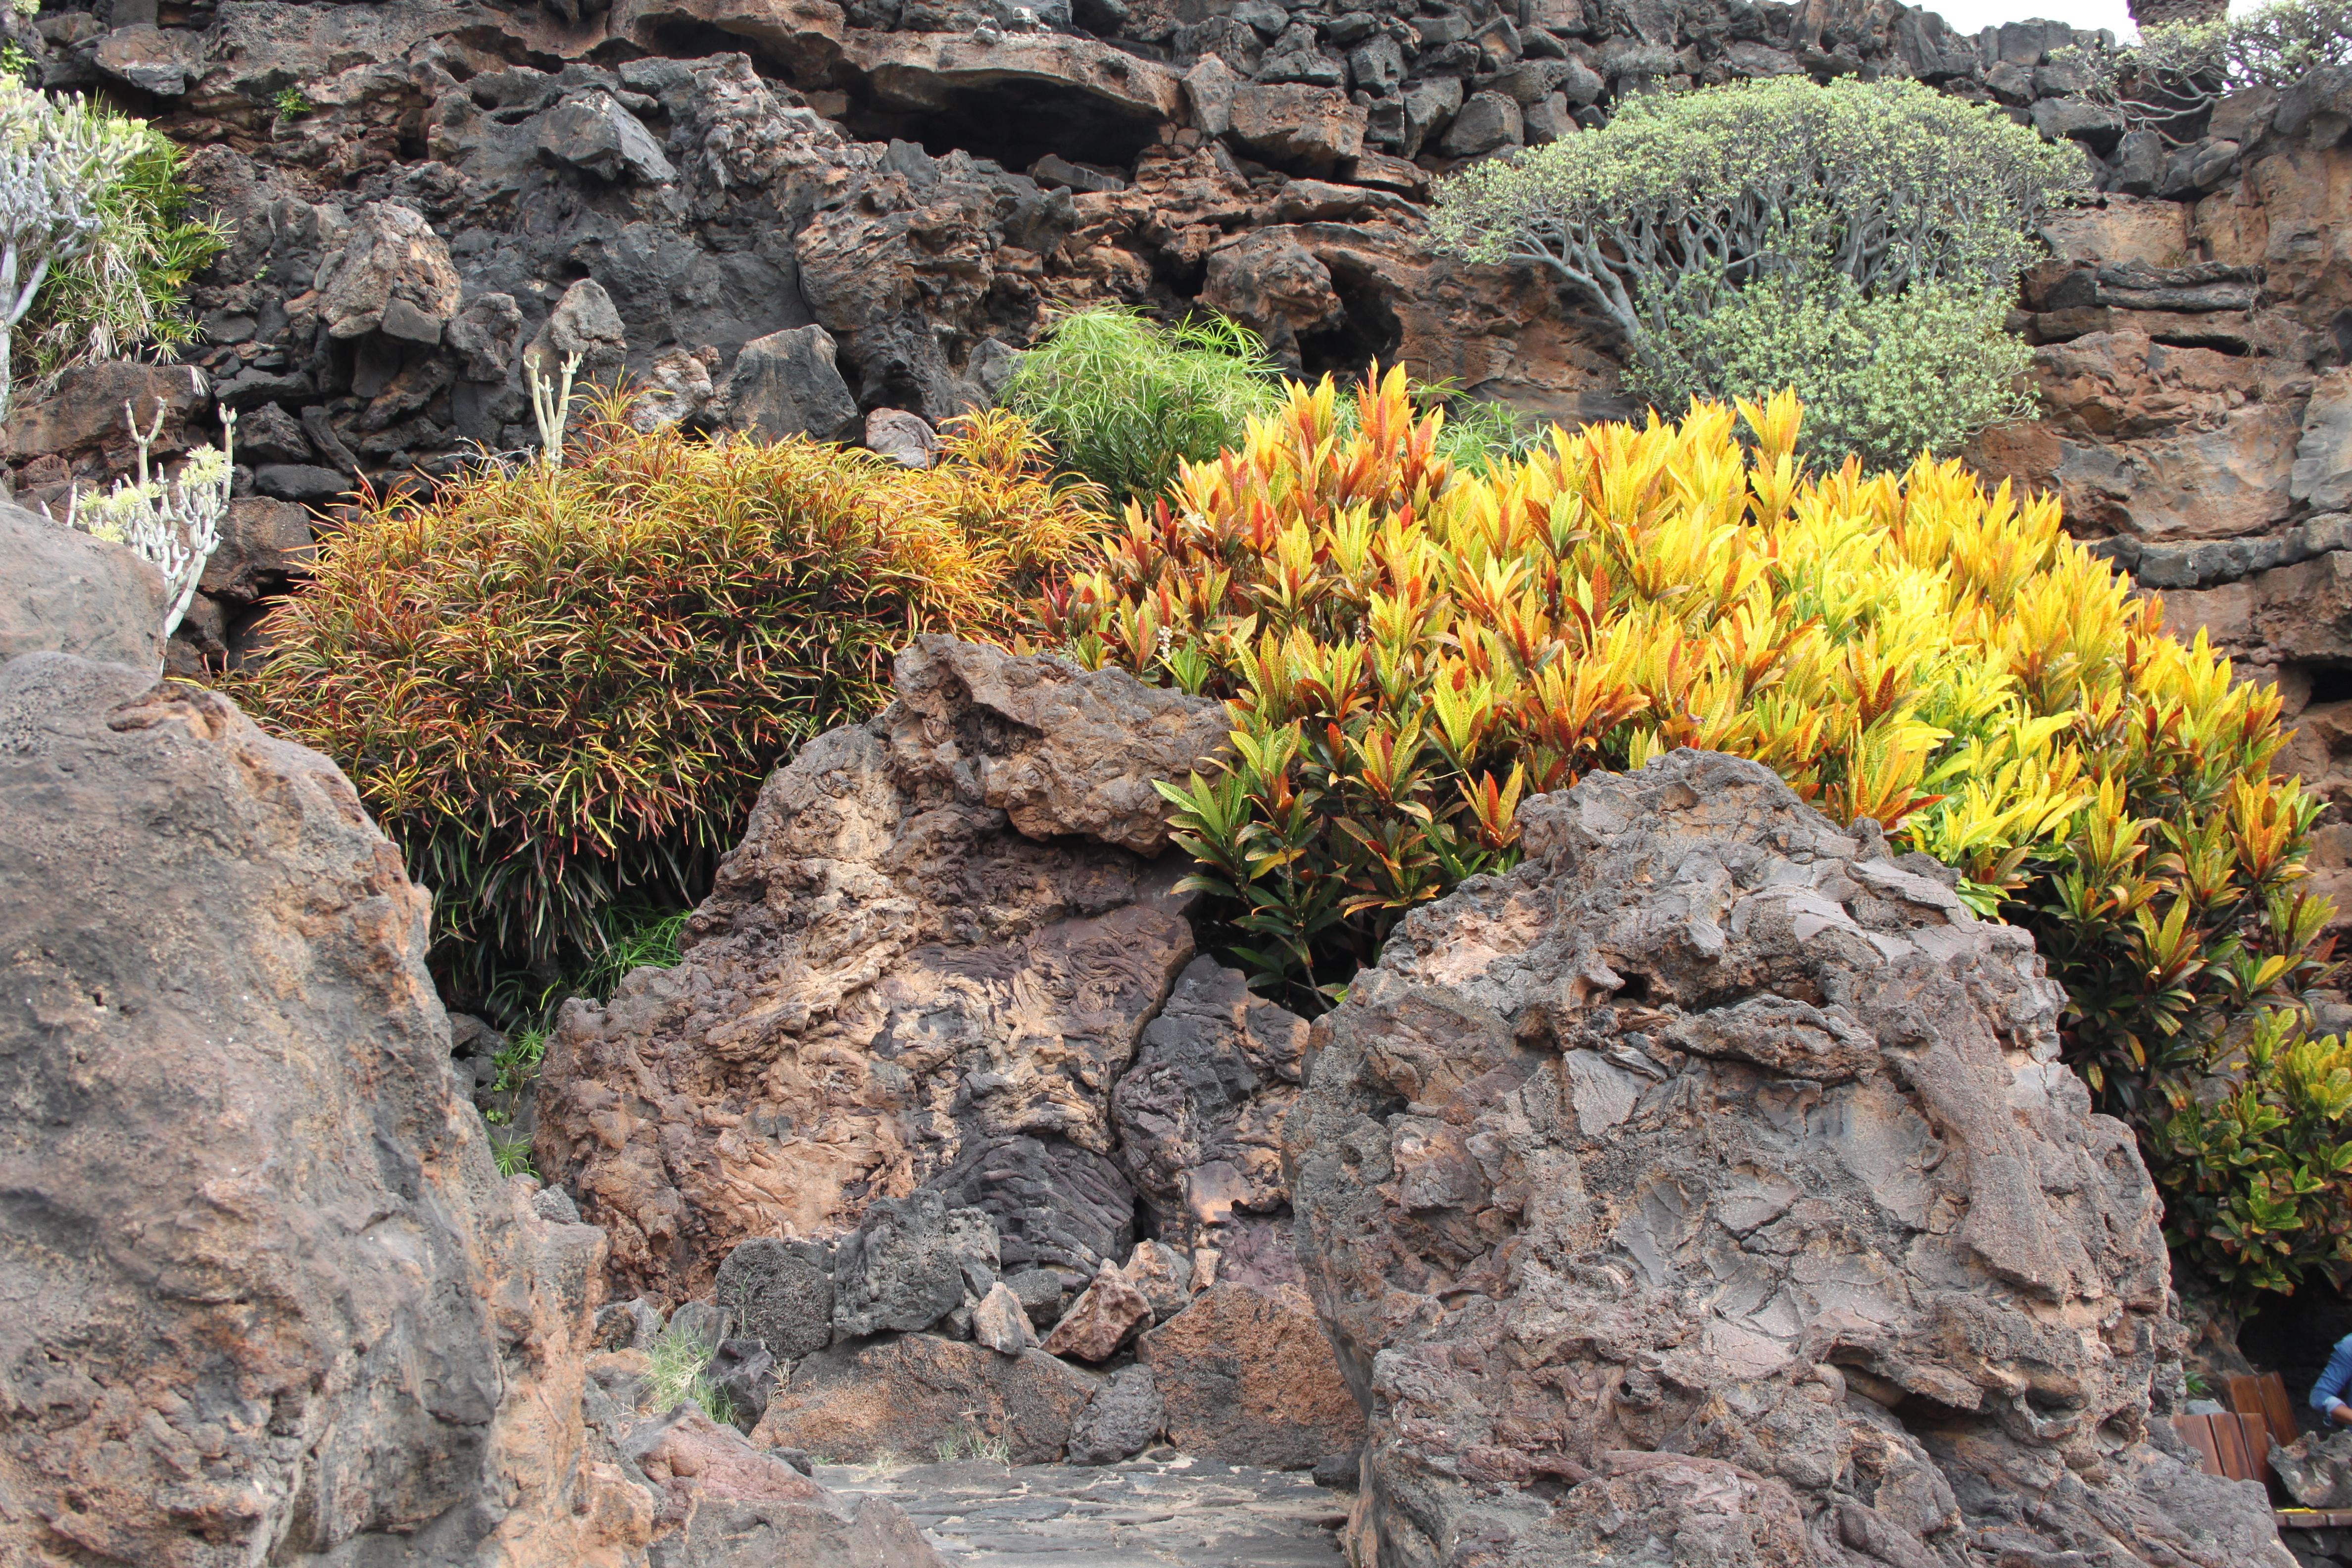 Aida Kreuzfahrt Kanaren und Madeira - Lanzarote - Jameos del Agua